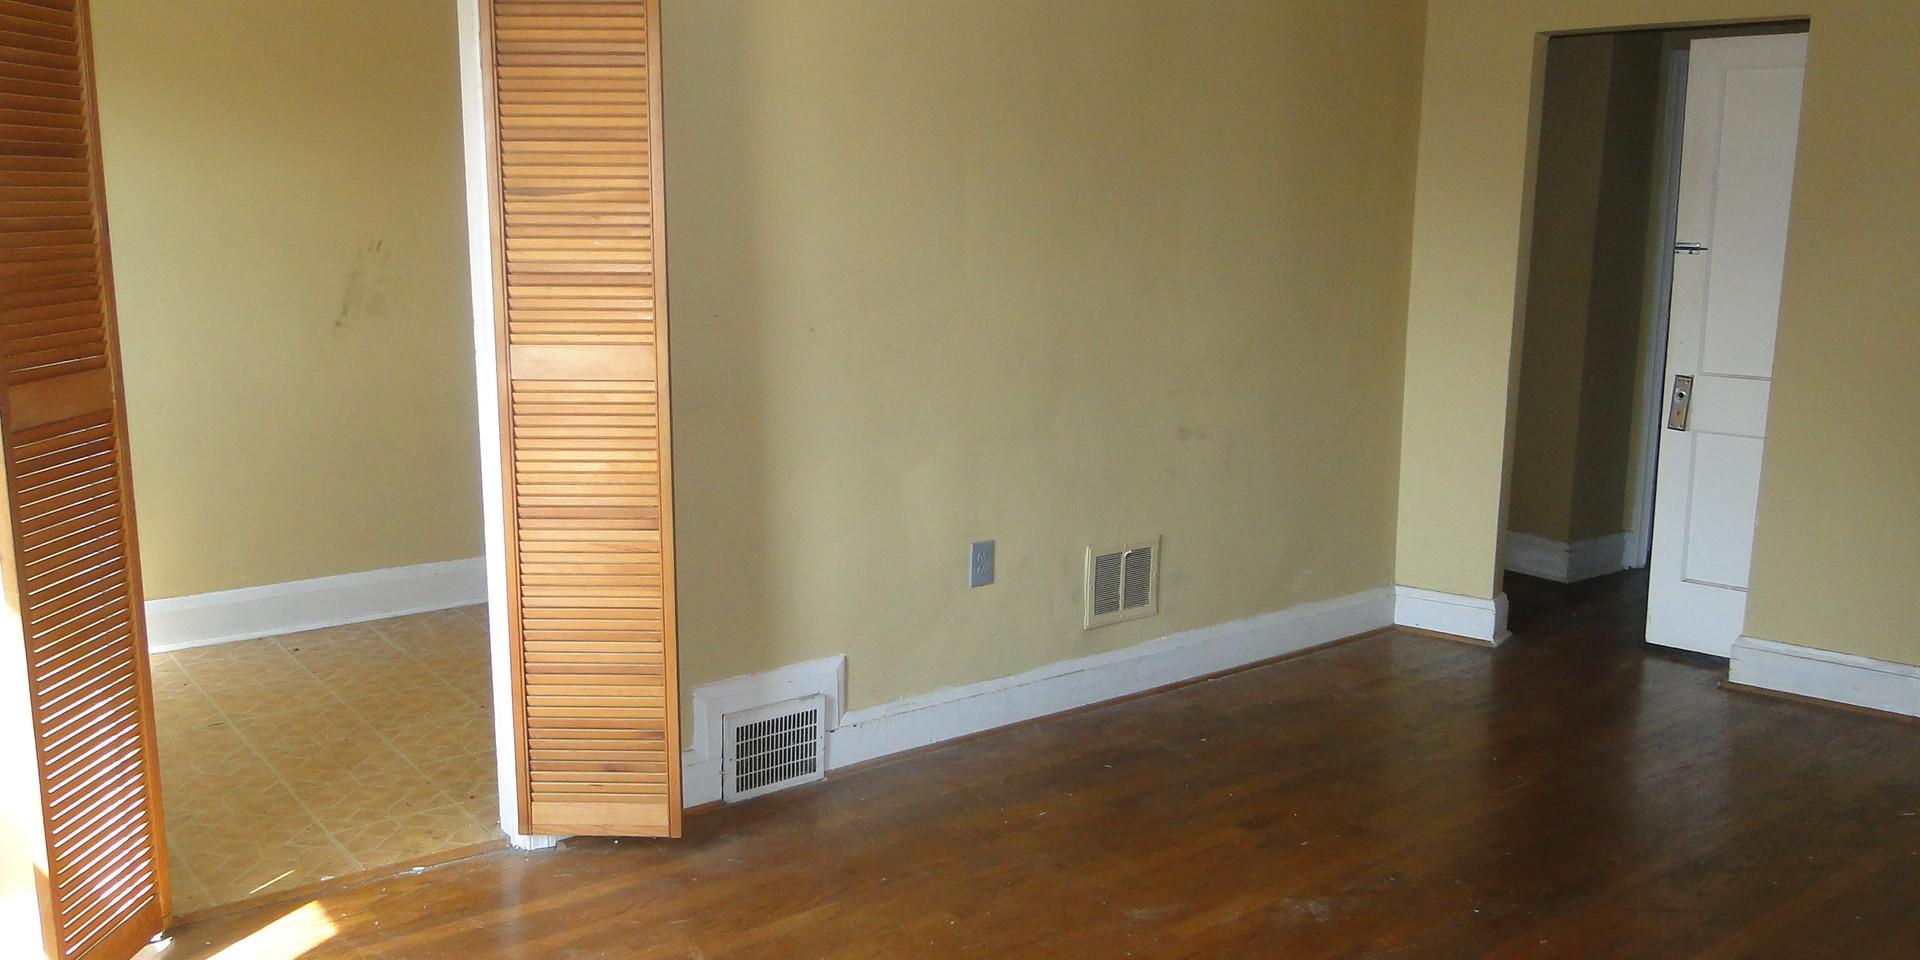 11 - Second Unit Living Room 1.JPG